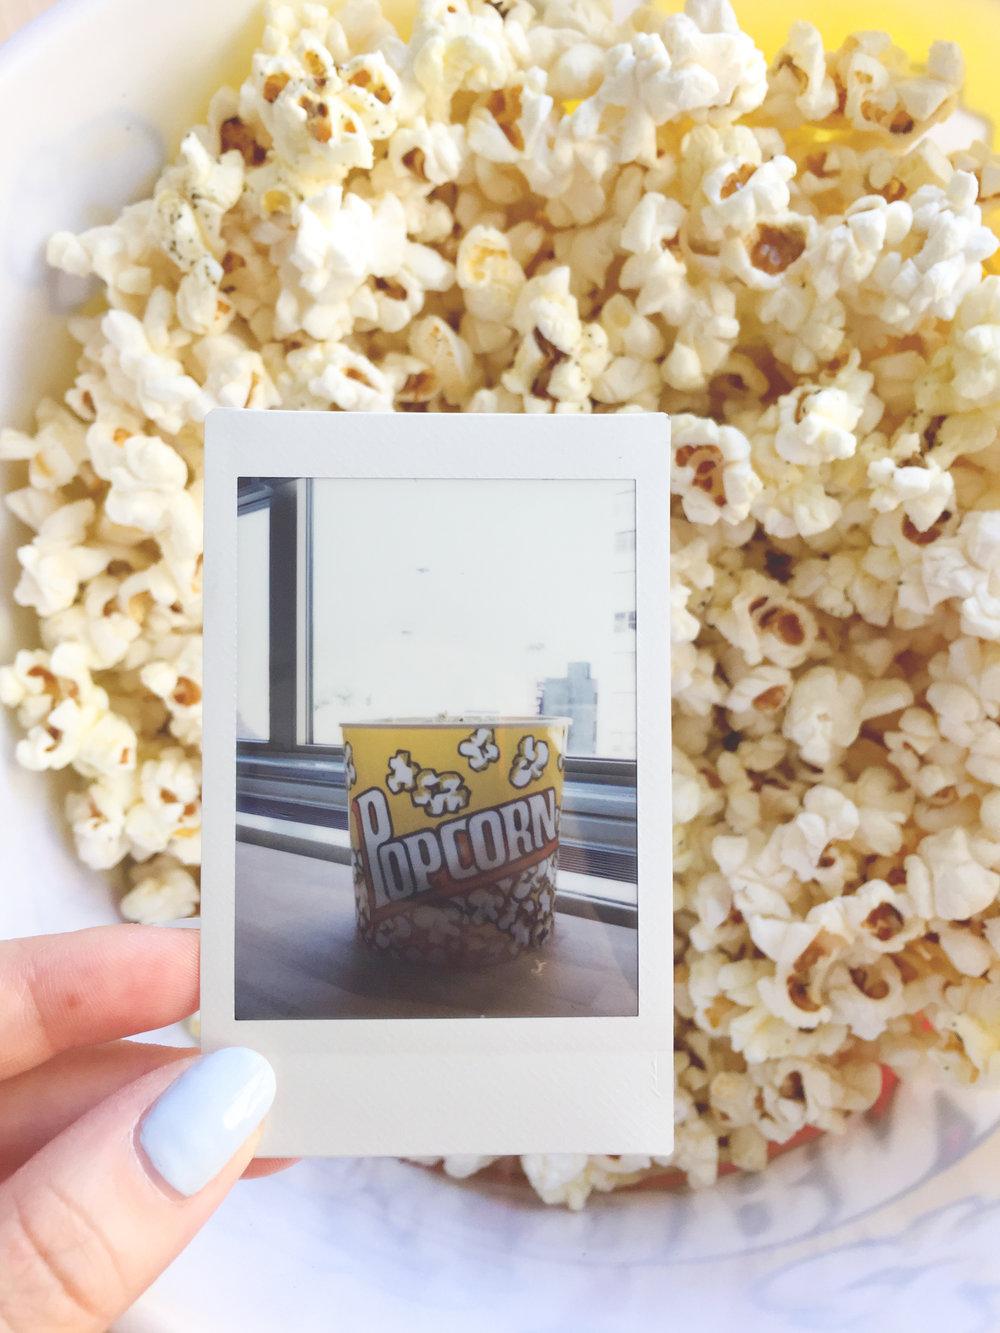 Freedman_Popcorn.jpg